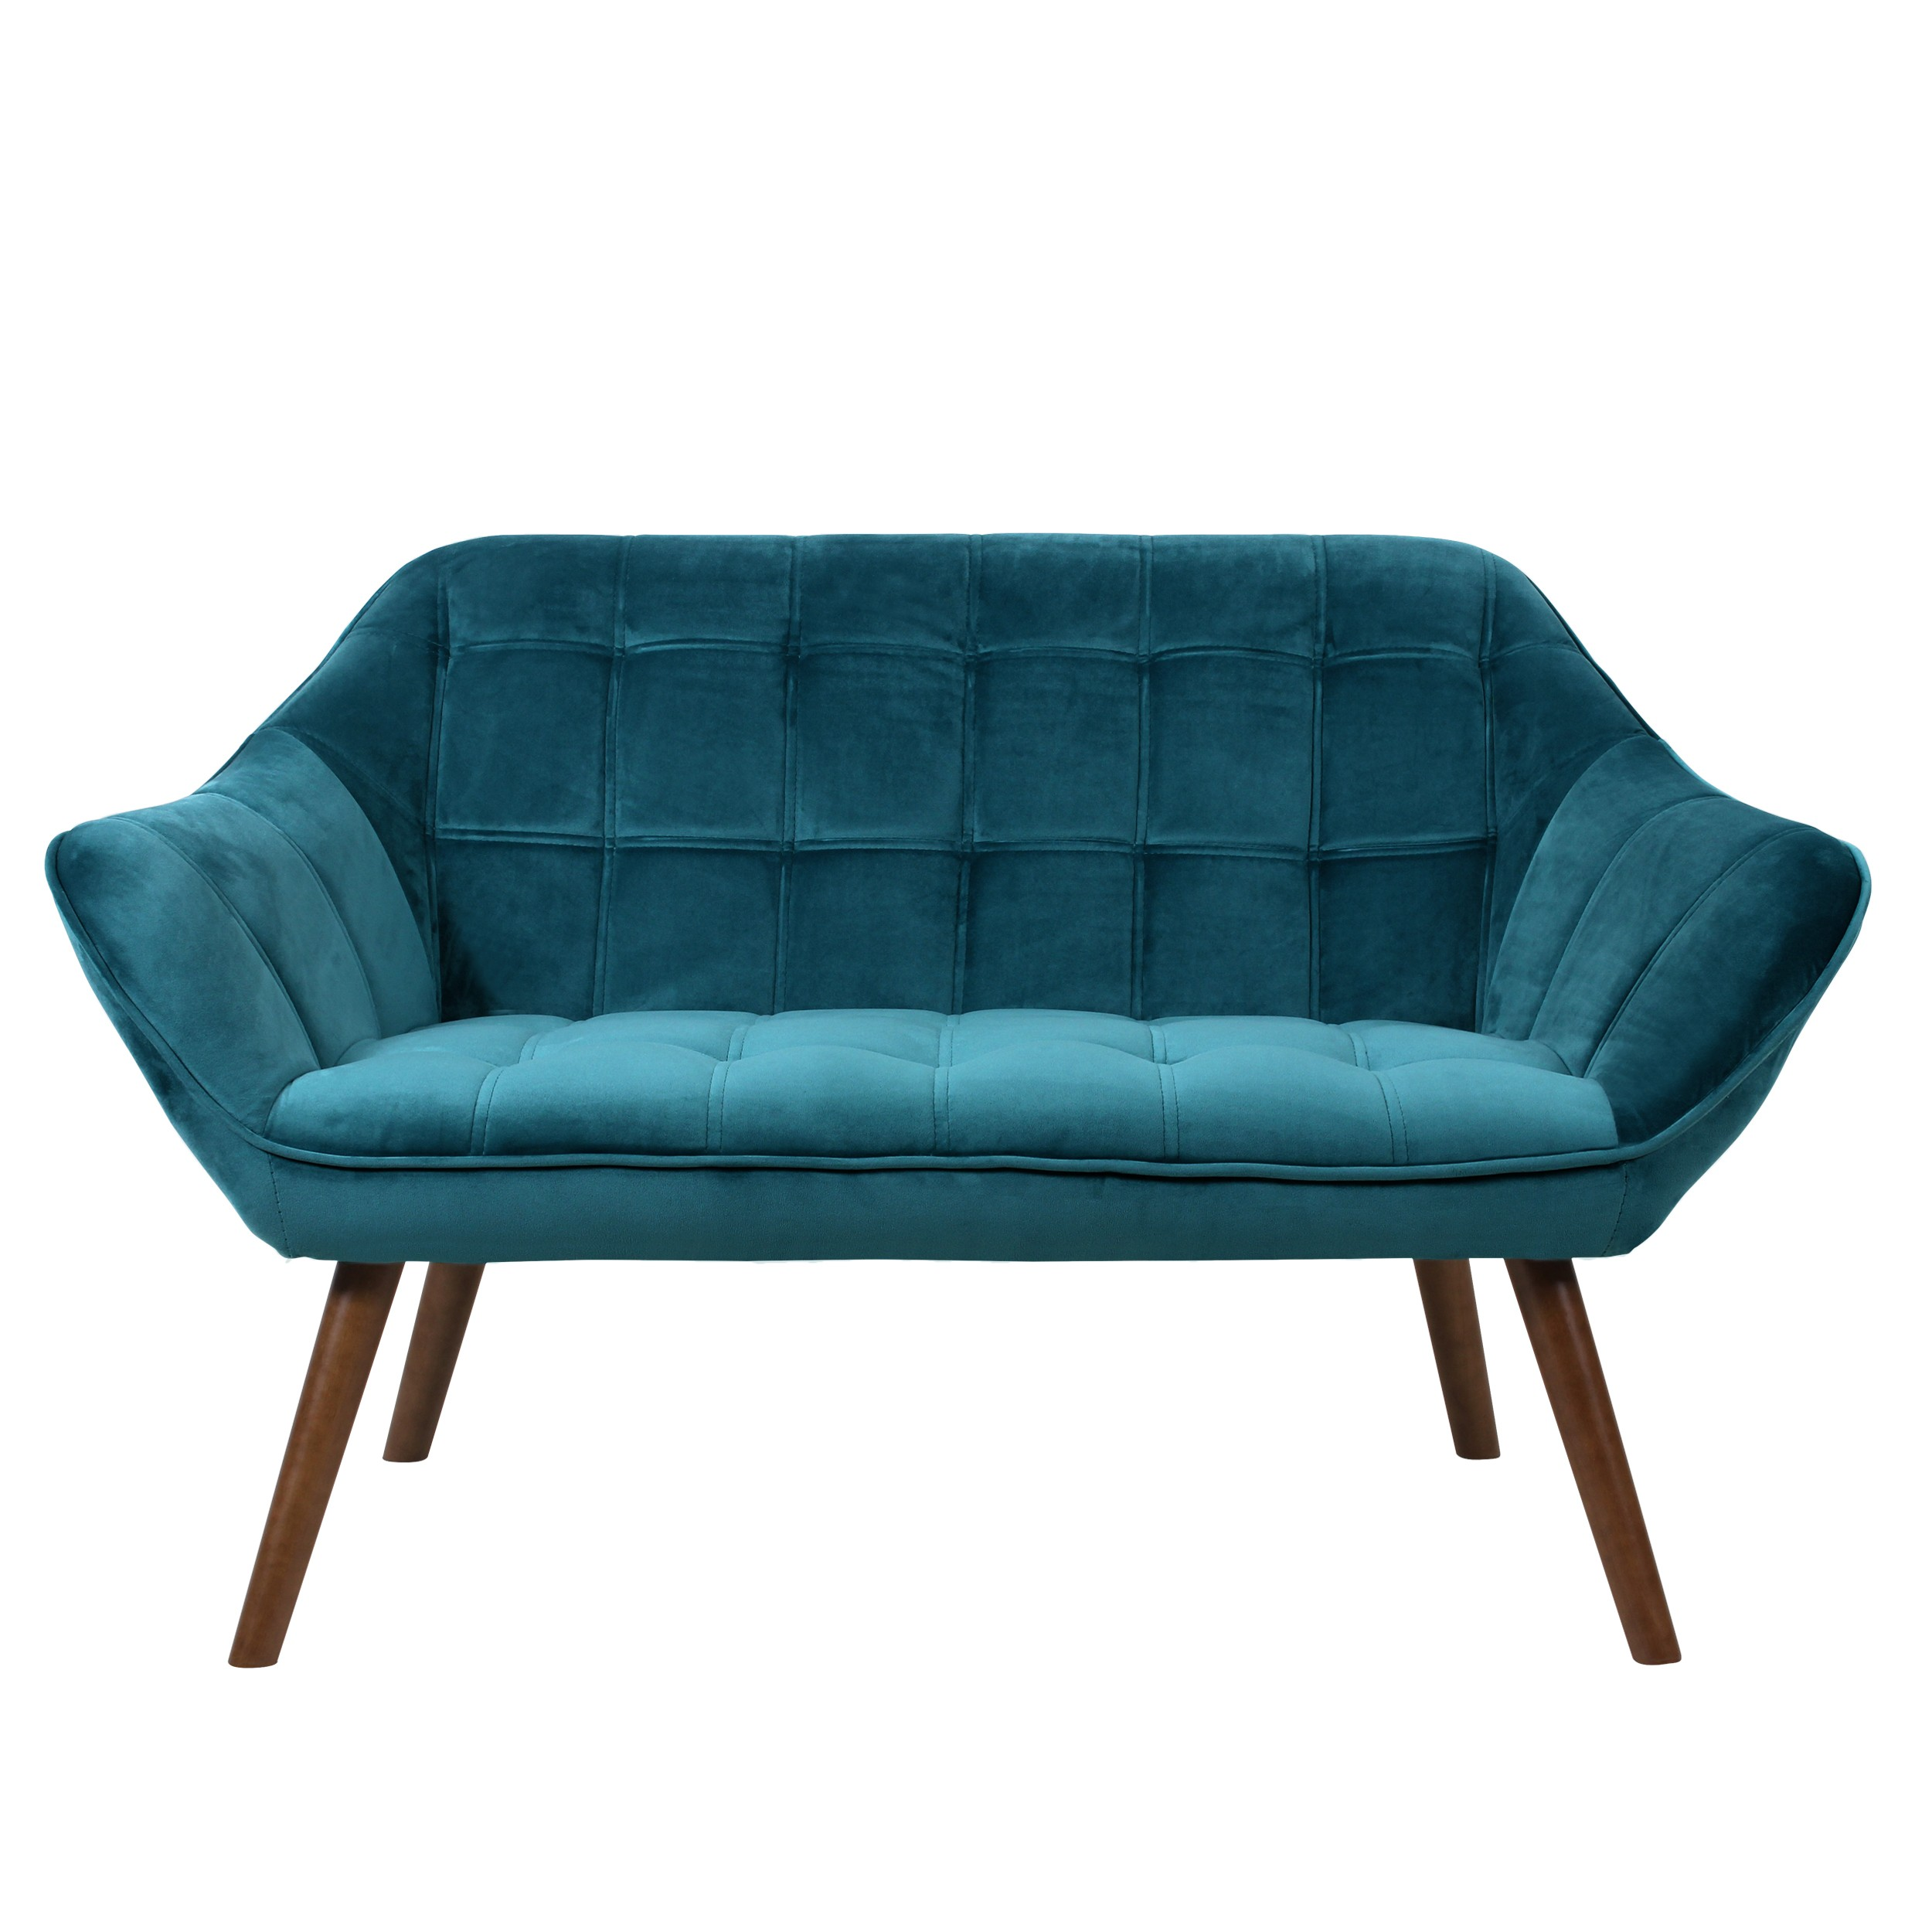 acheter canape 2 places velours turquoise